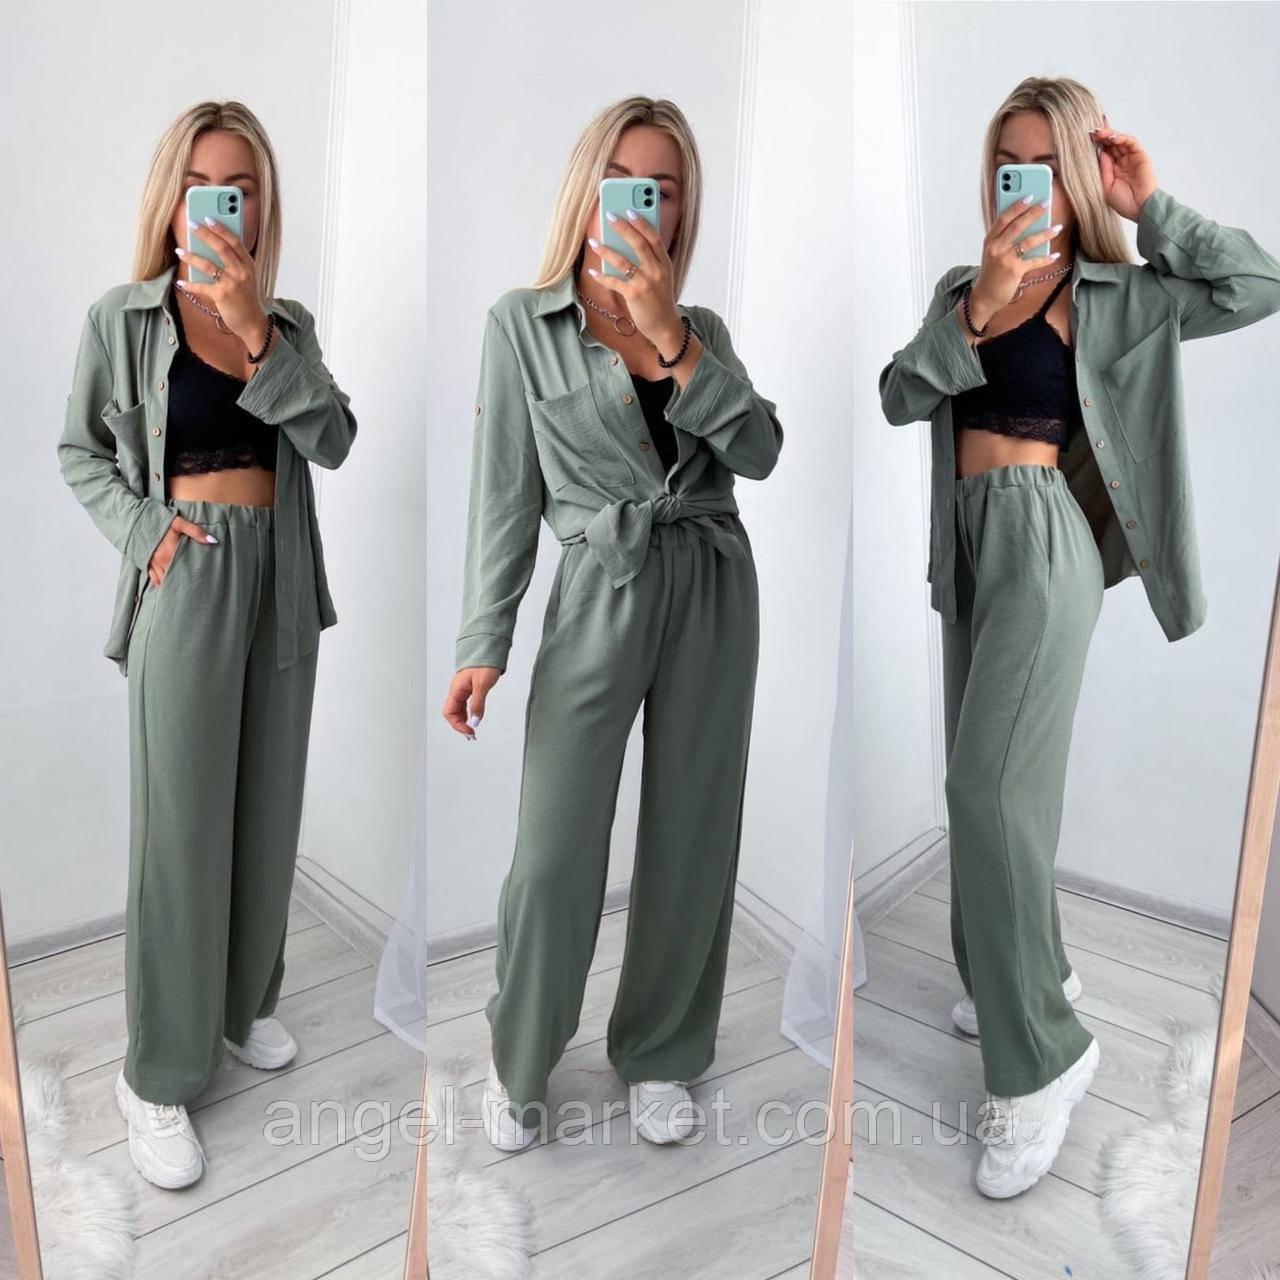 Женский костюм рубашка+брюки,женские костюмы,,Новинка 2020